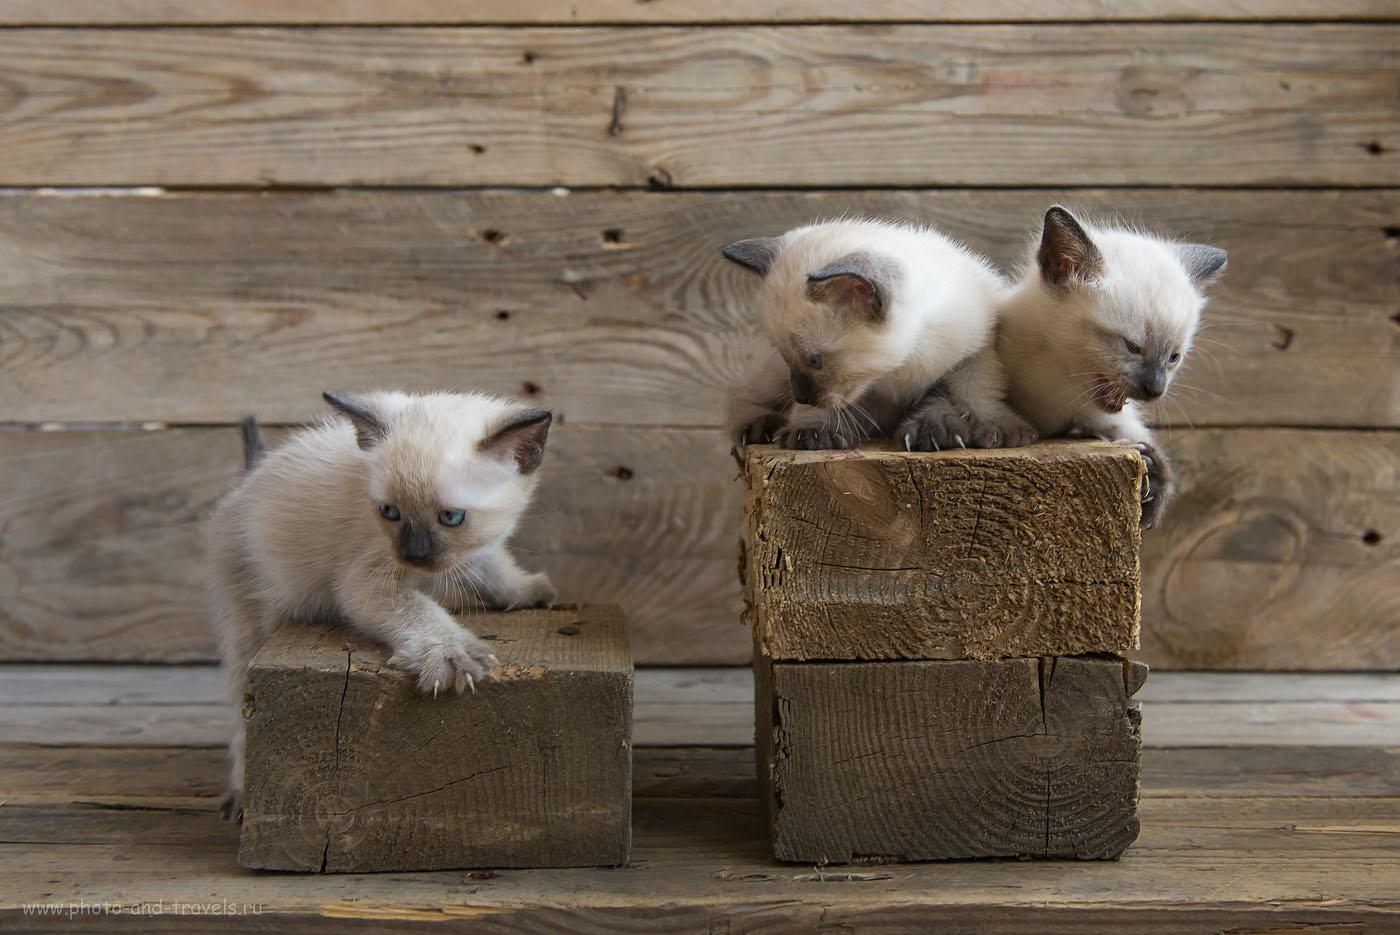 Фото 13. Курсы фотографов. Фотостудия для съемки котят при естественном свете от окна (1000, 38, f5.6, 1/125)